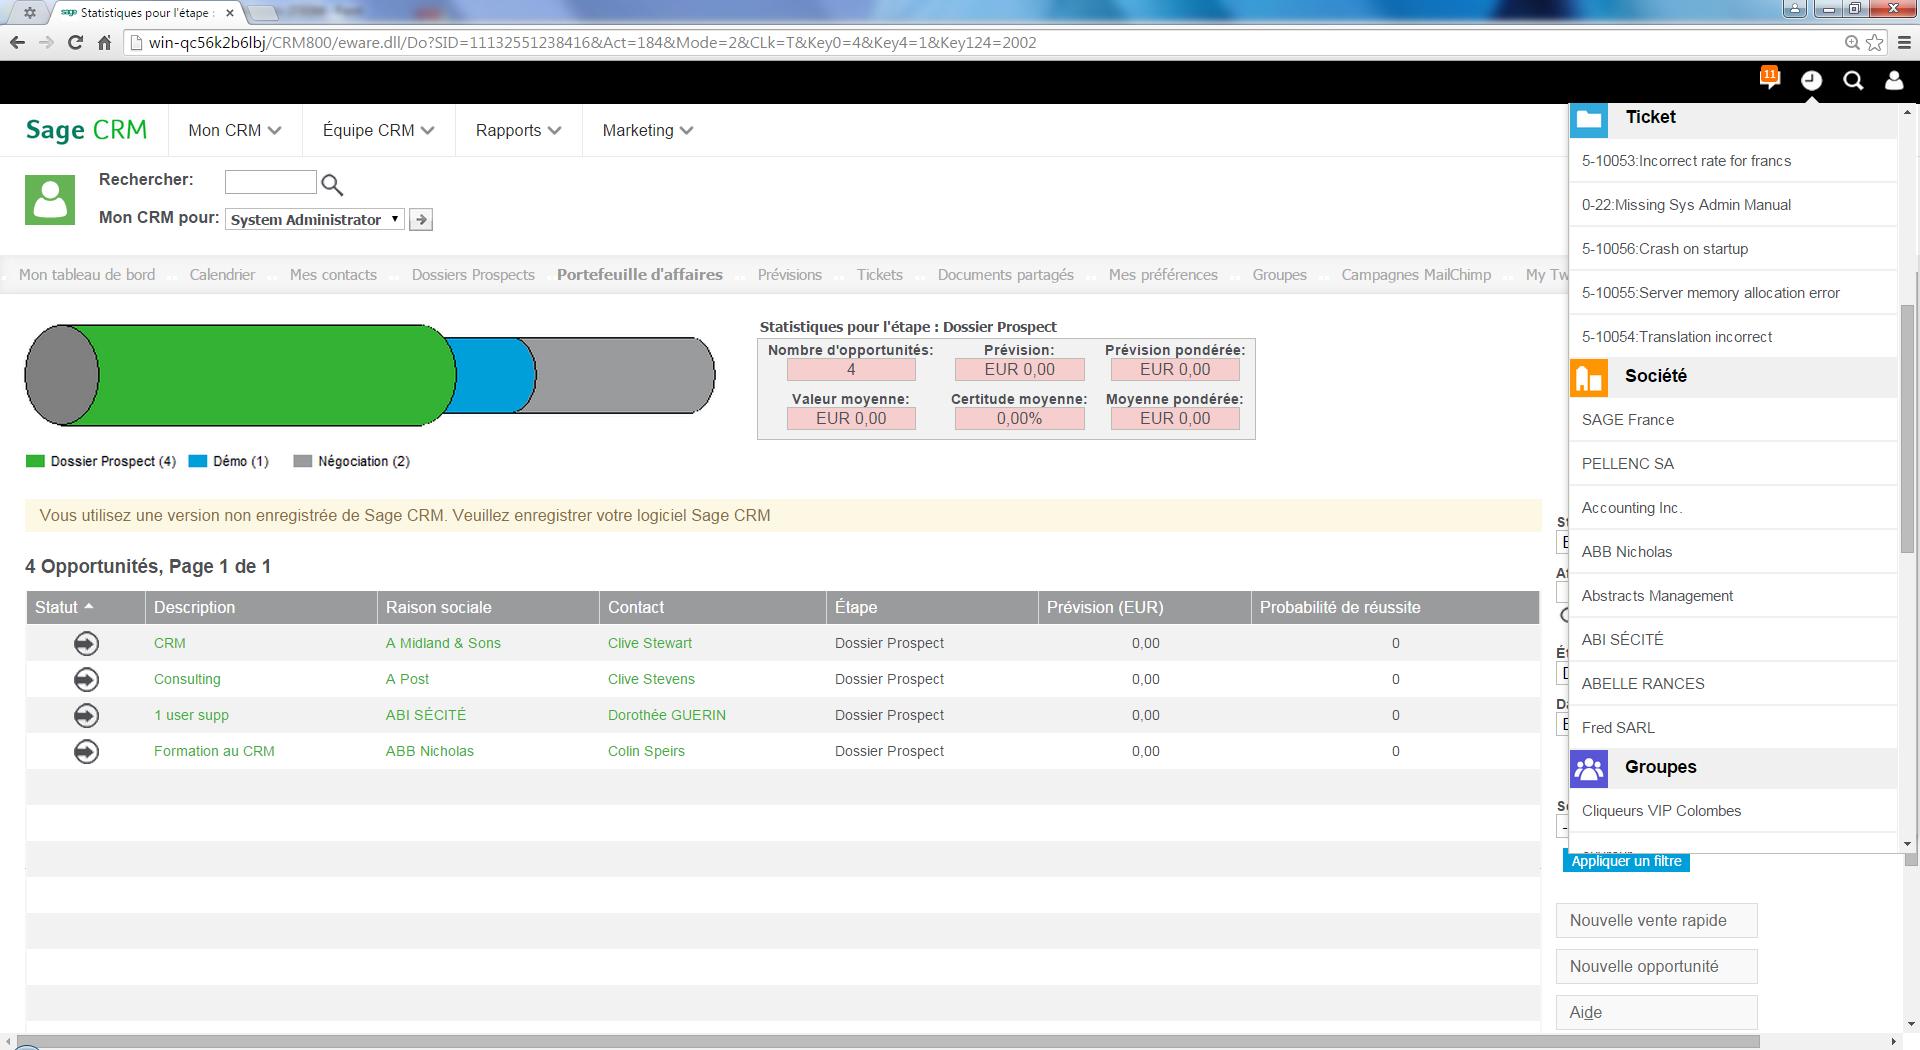 Sage CRM: Interface web adaptive, Base de savoir, wiki, Modules